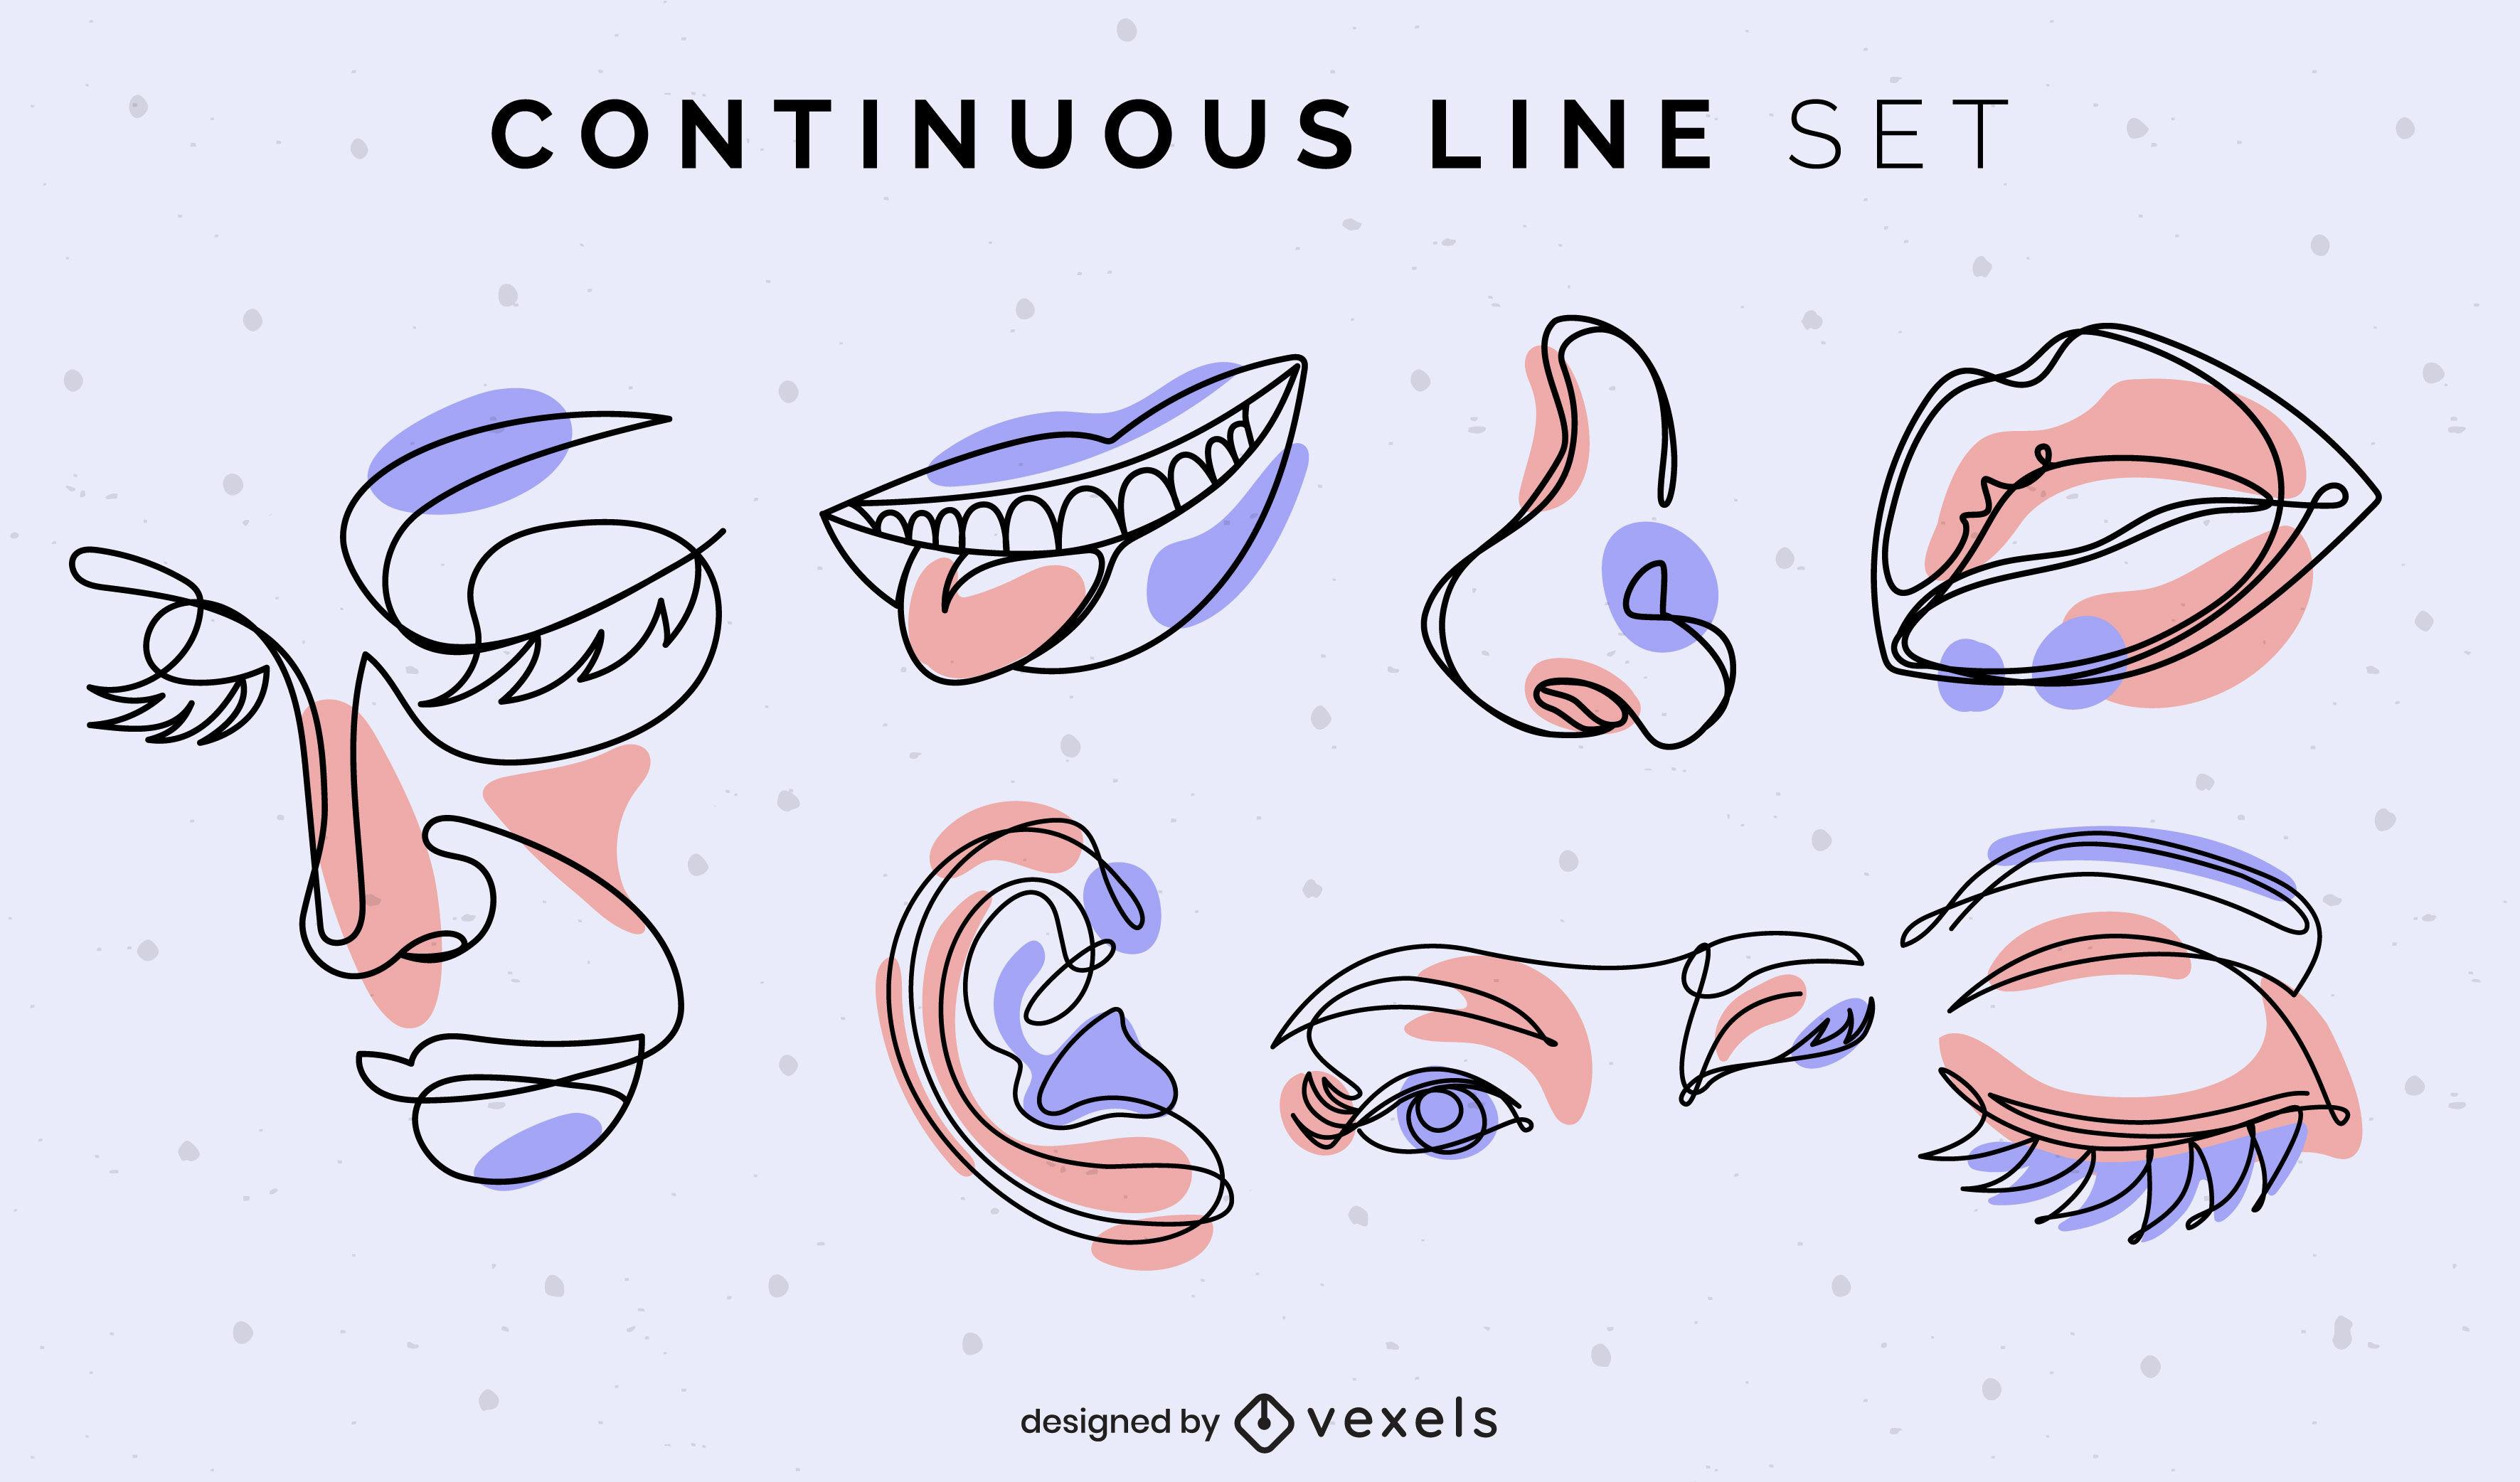 Face anatomy items continuous line set